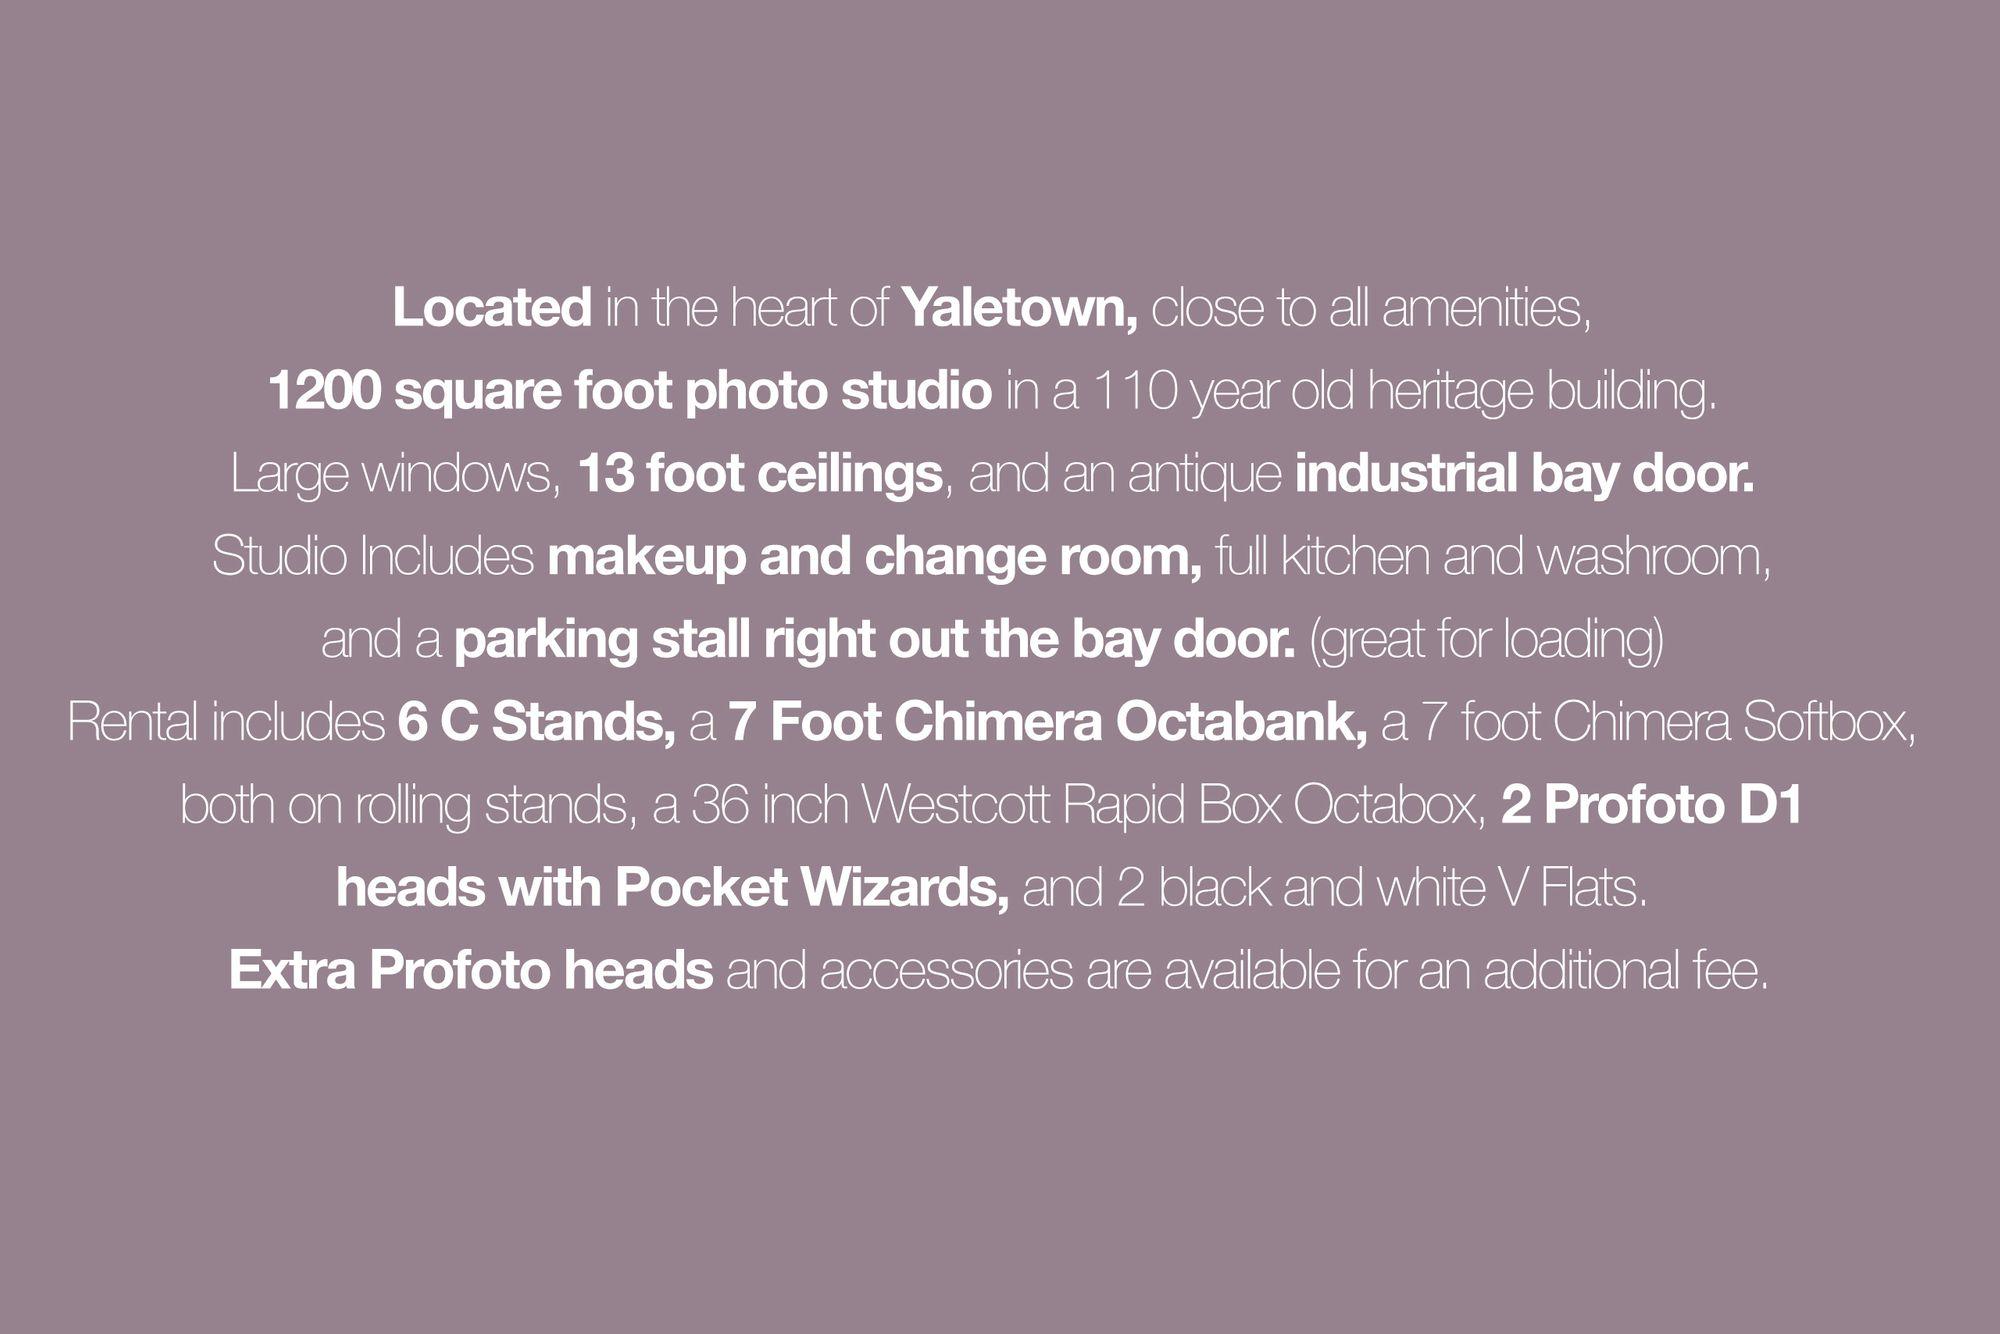 LocatedInHeartOfYaletown.jpg